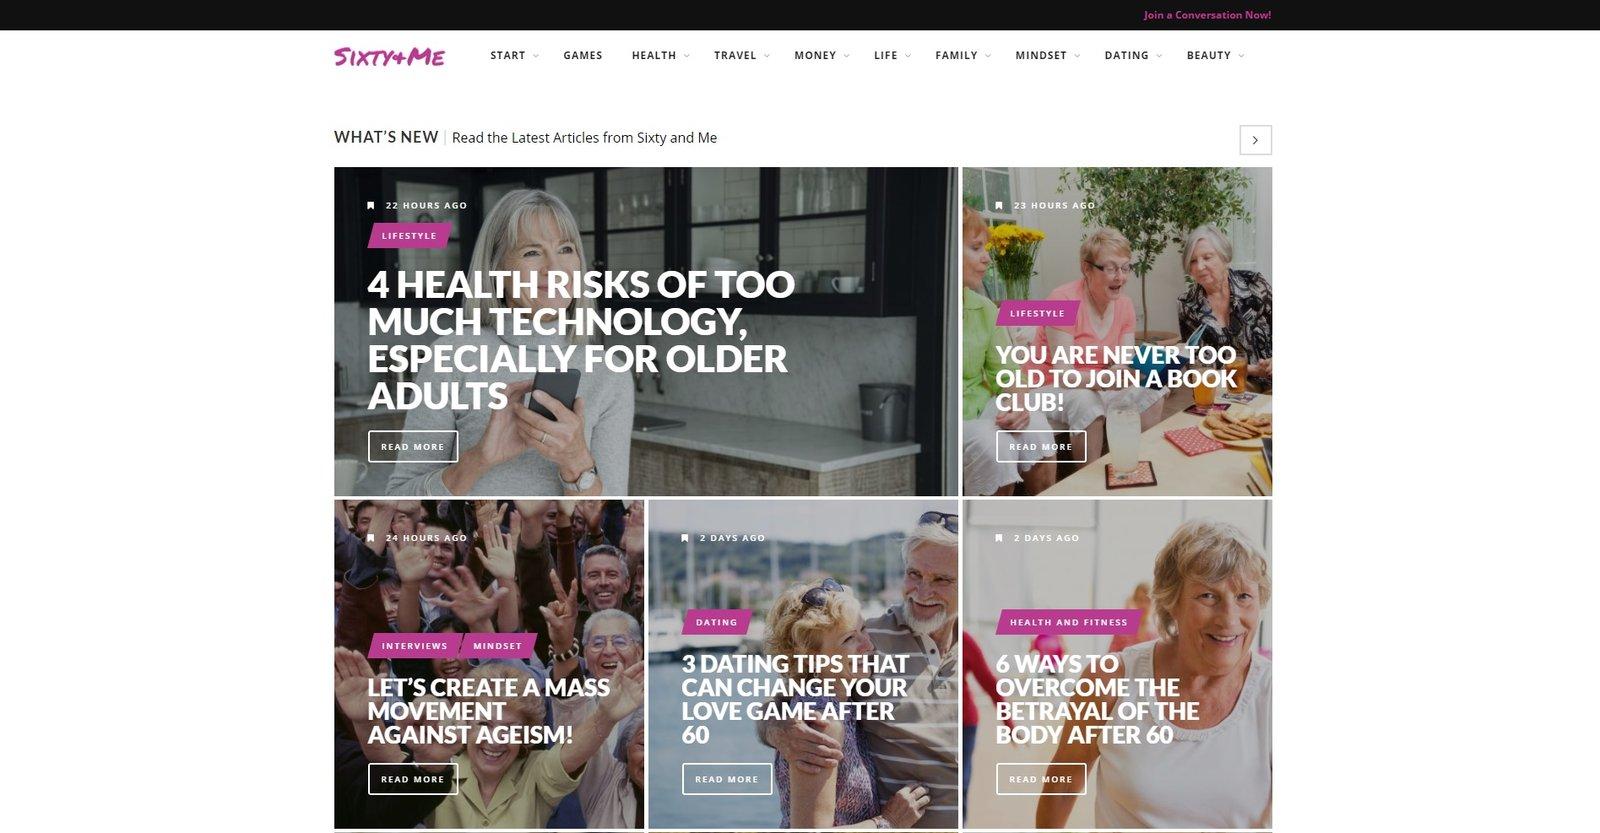 web design of Sixty Me